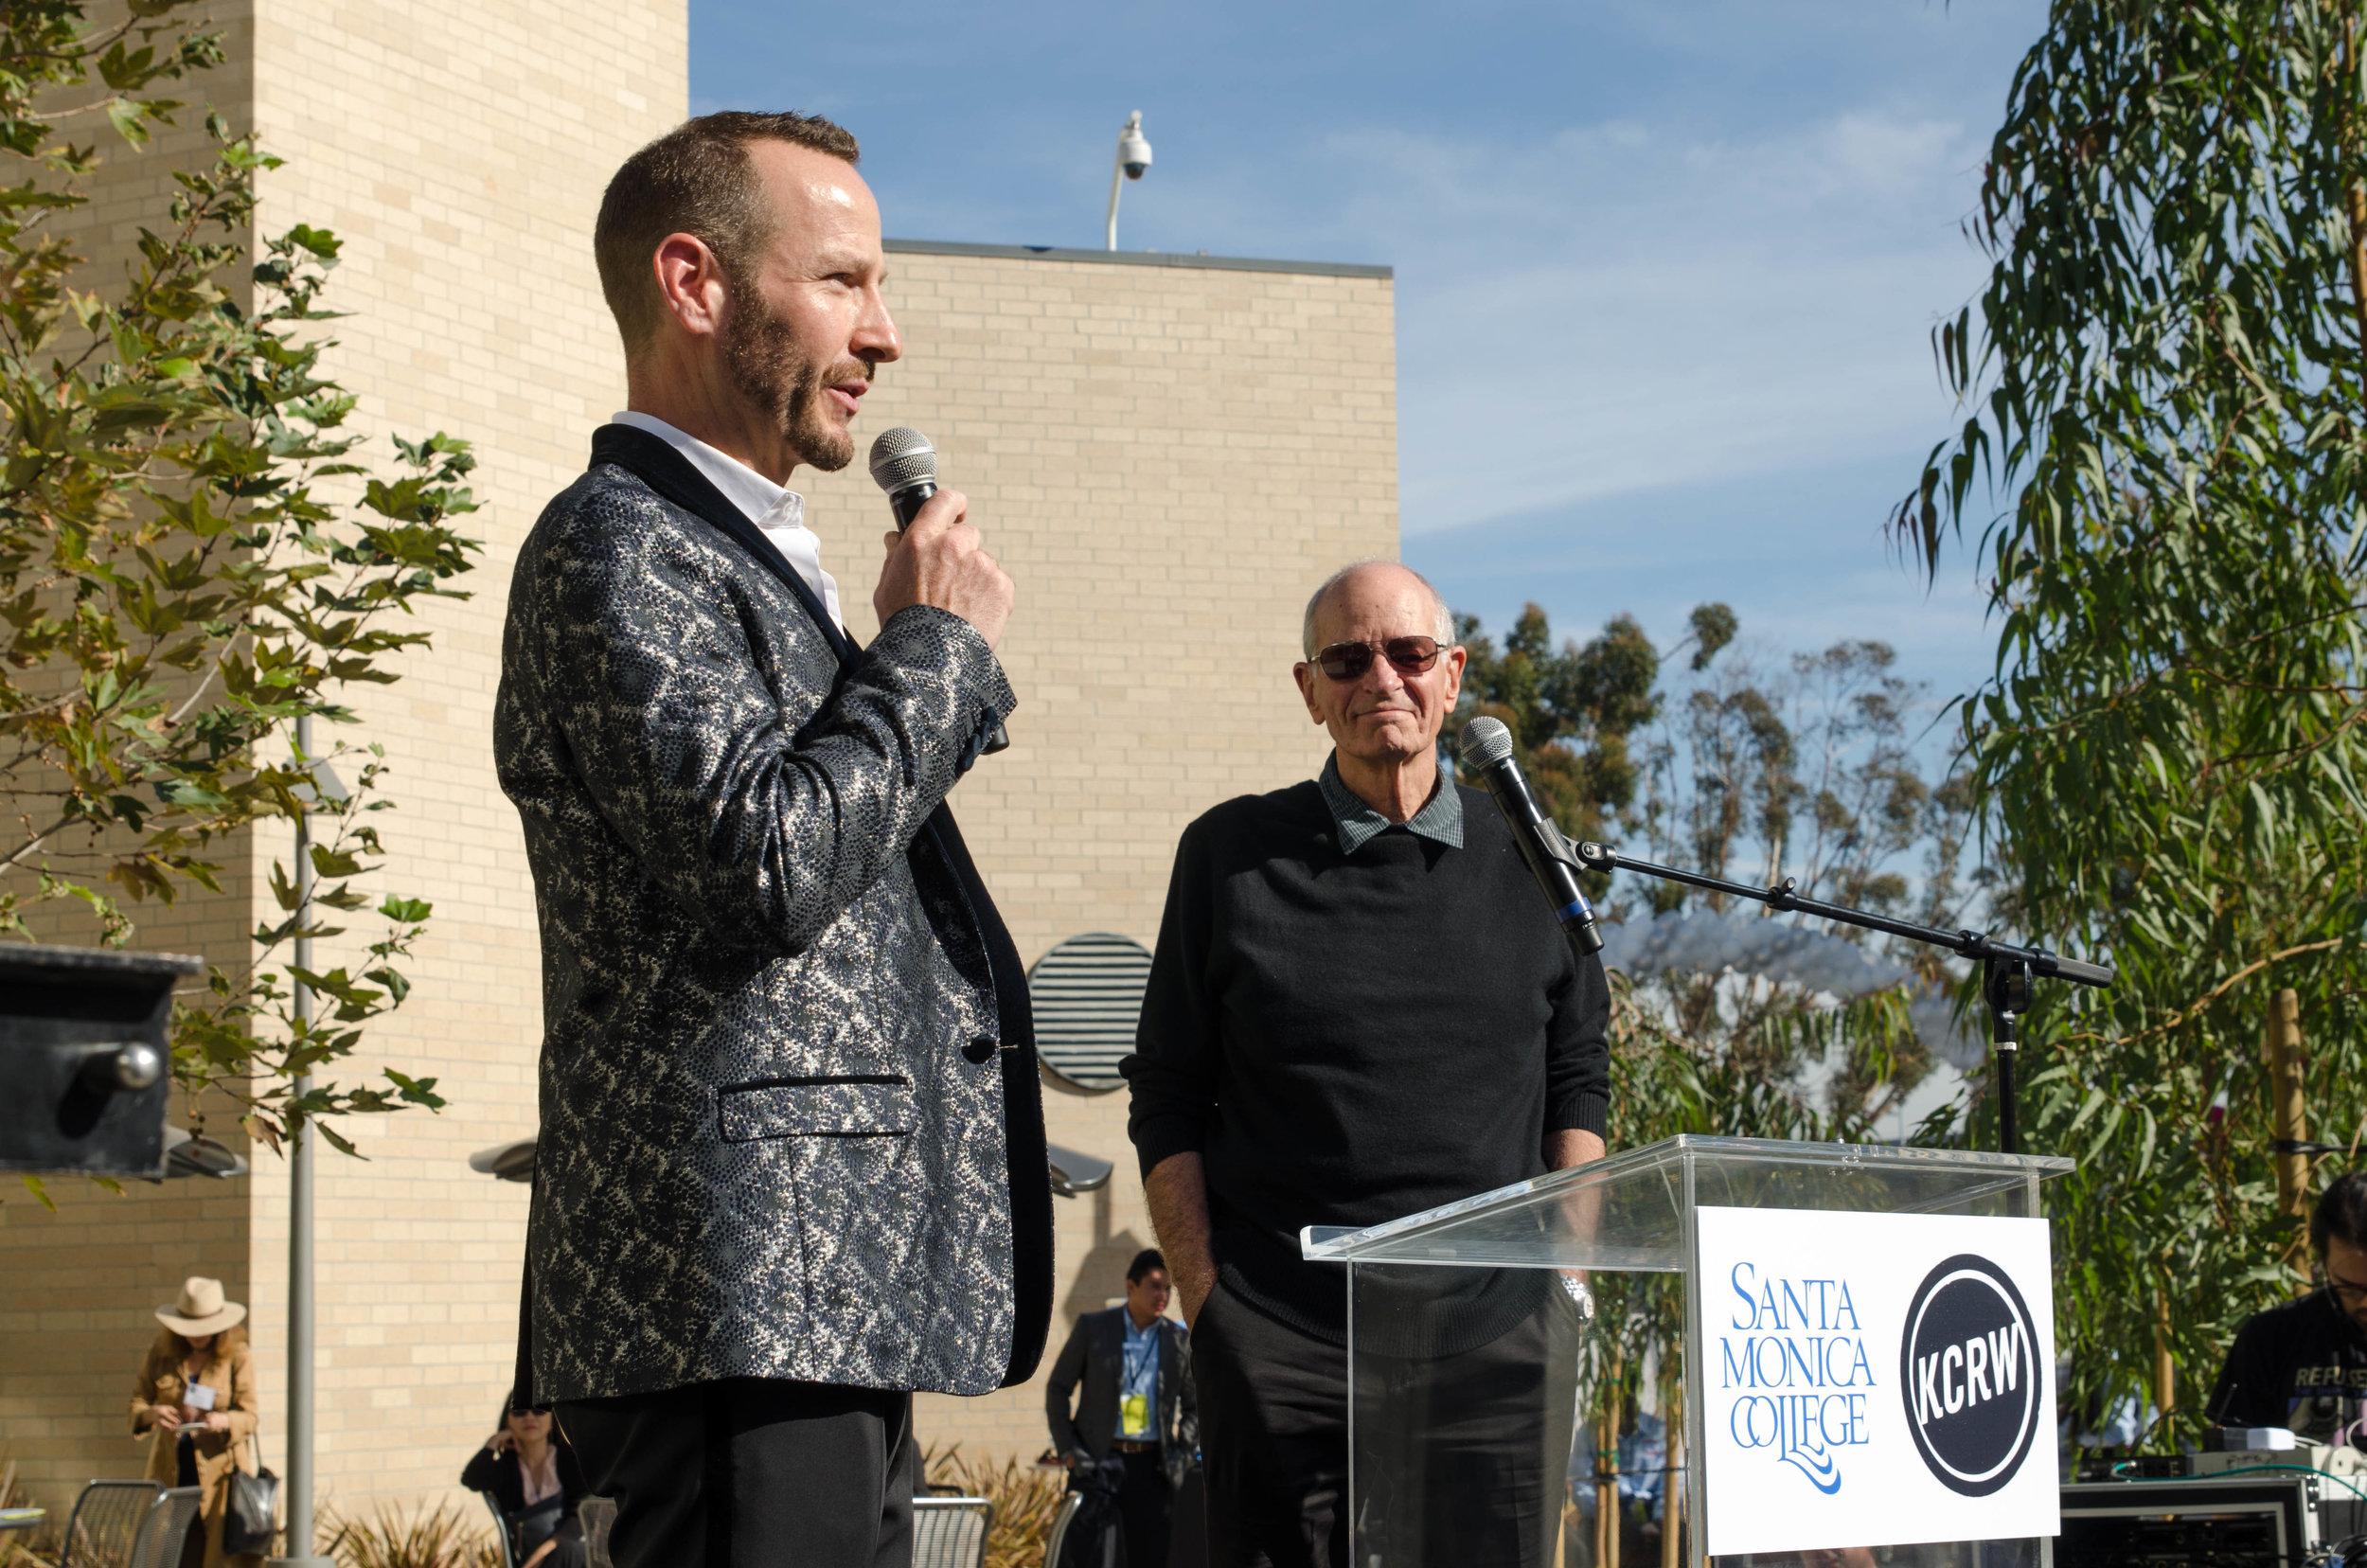 (Left to Right) KCRW Music Director Jason Bentley and KCRW Host Warren Olney speak at the ribbon cutting ceremony for KCRW and CMD. Santa Monica College CMD Campus. Santa Monica, Calif. December 2,2017 (Photo by: Diana Parra Garcia)